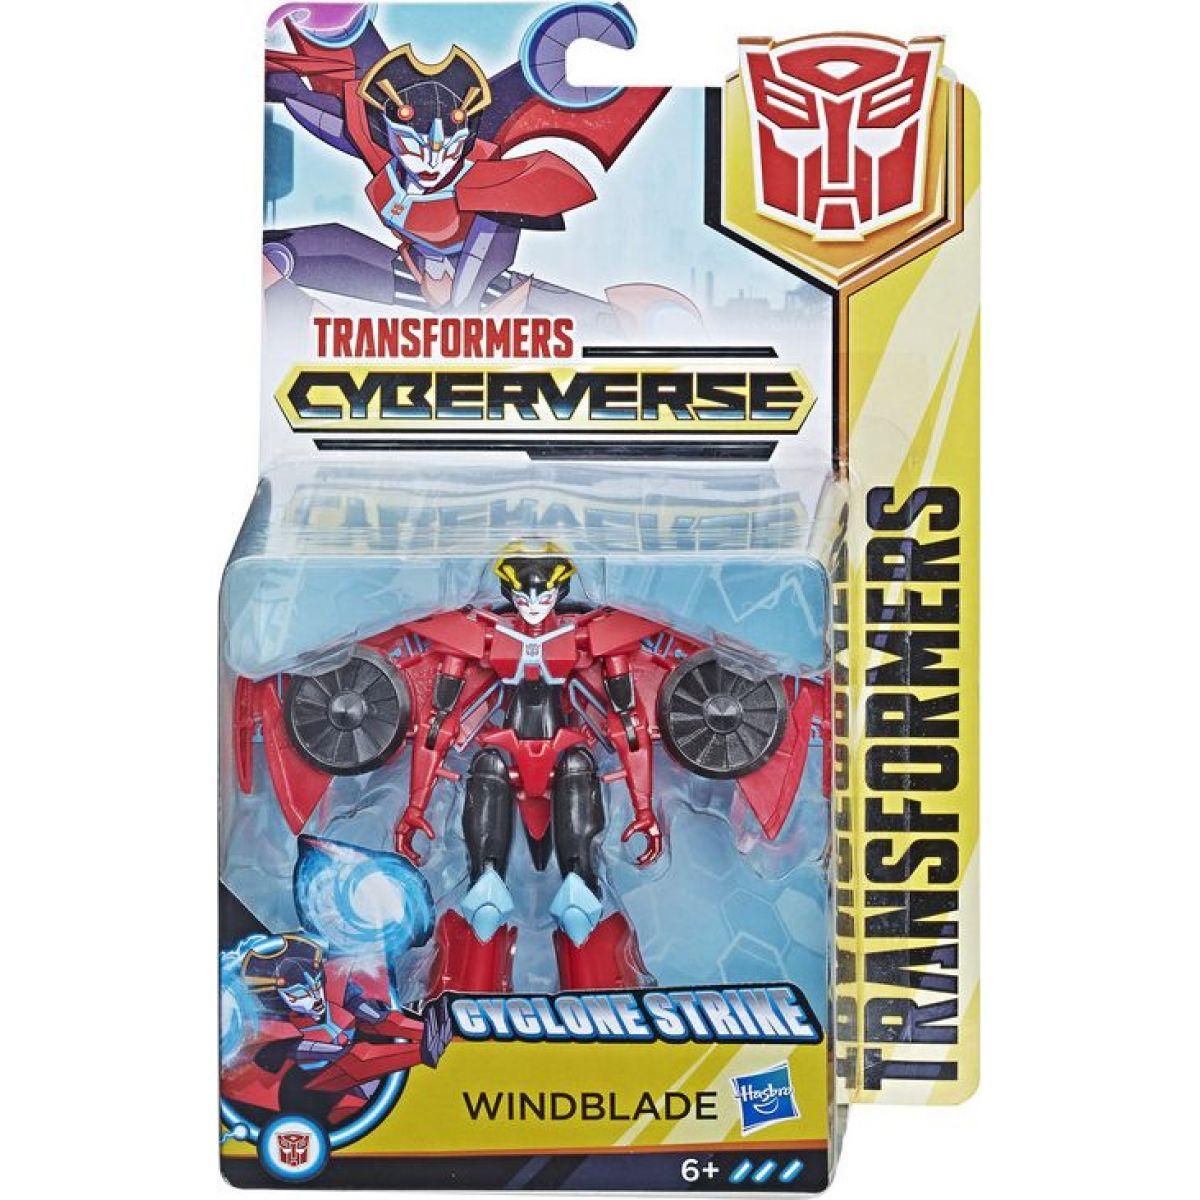 Hasbro Transformers Action attacker 15 Windblade